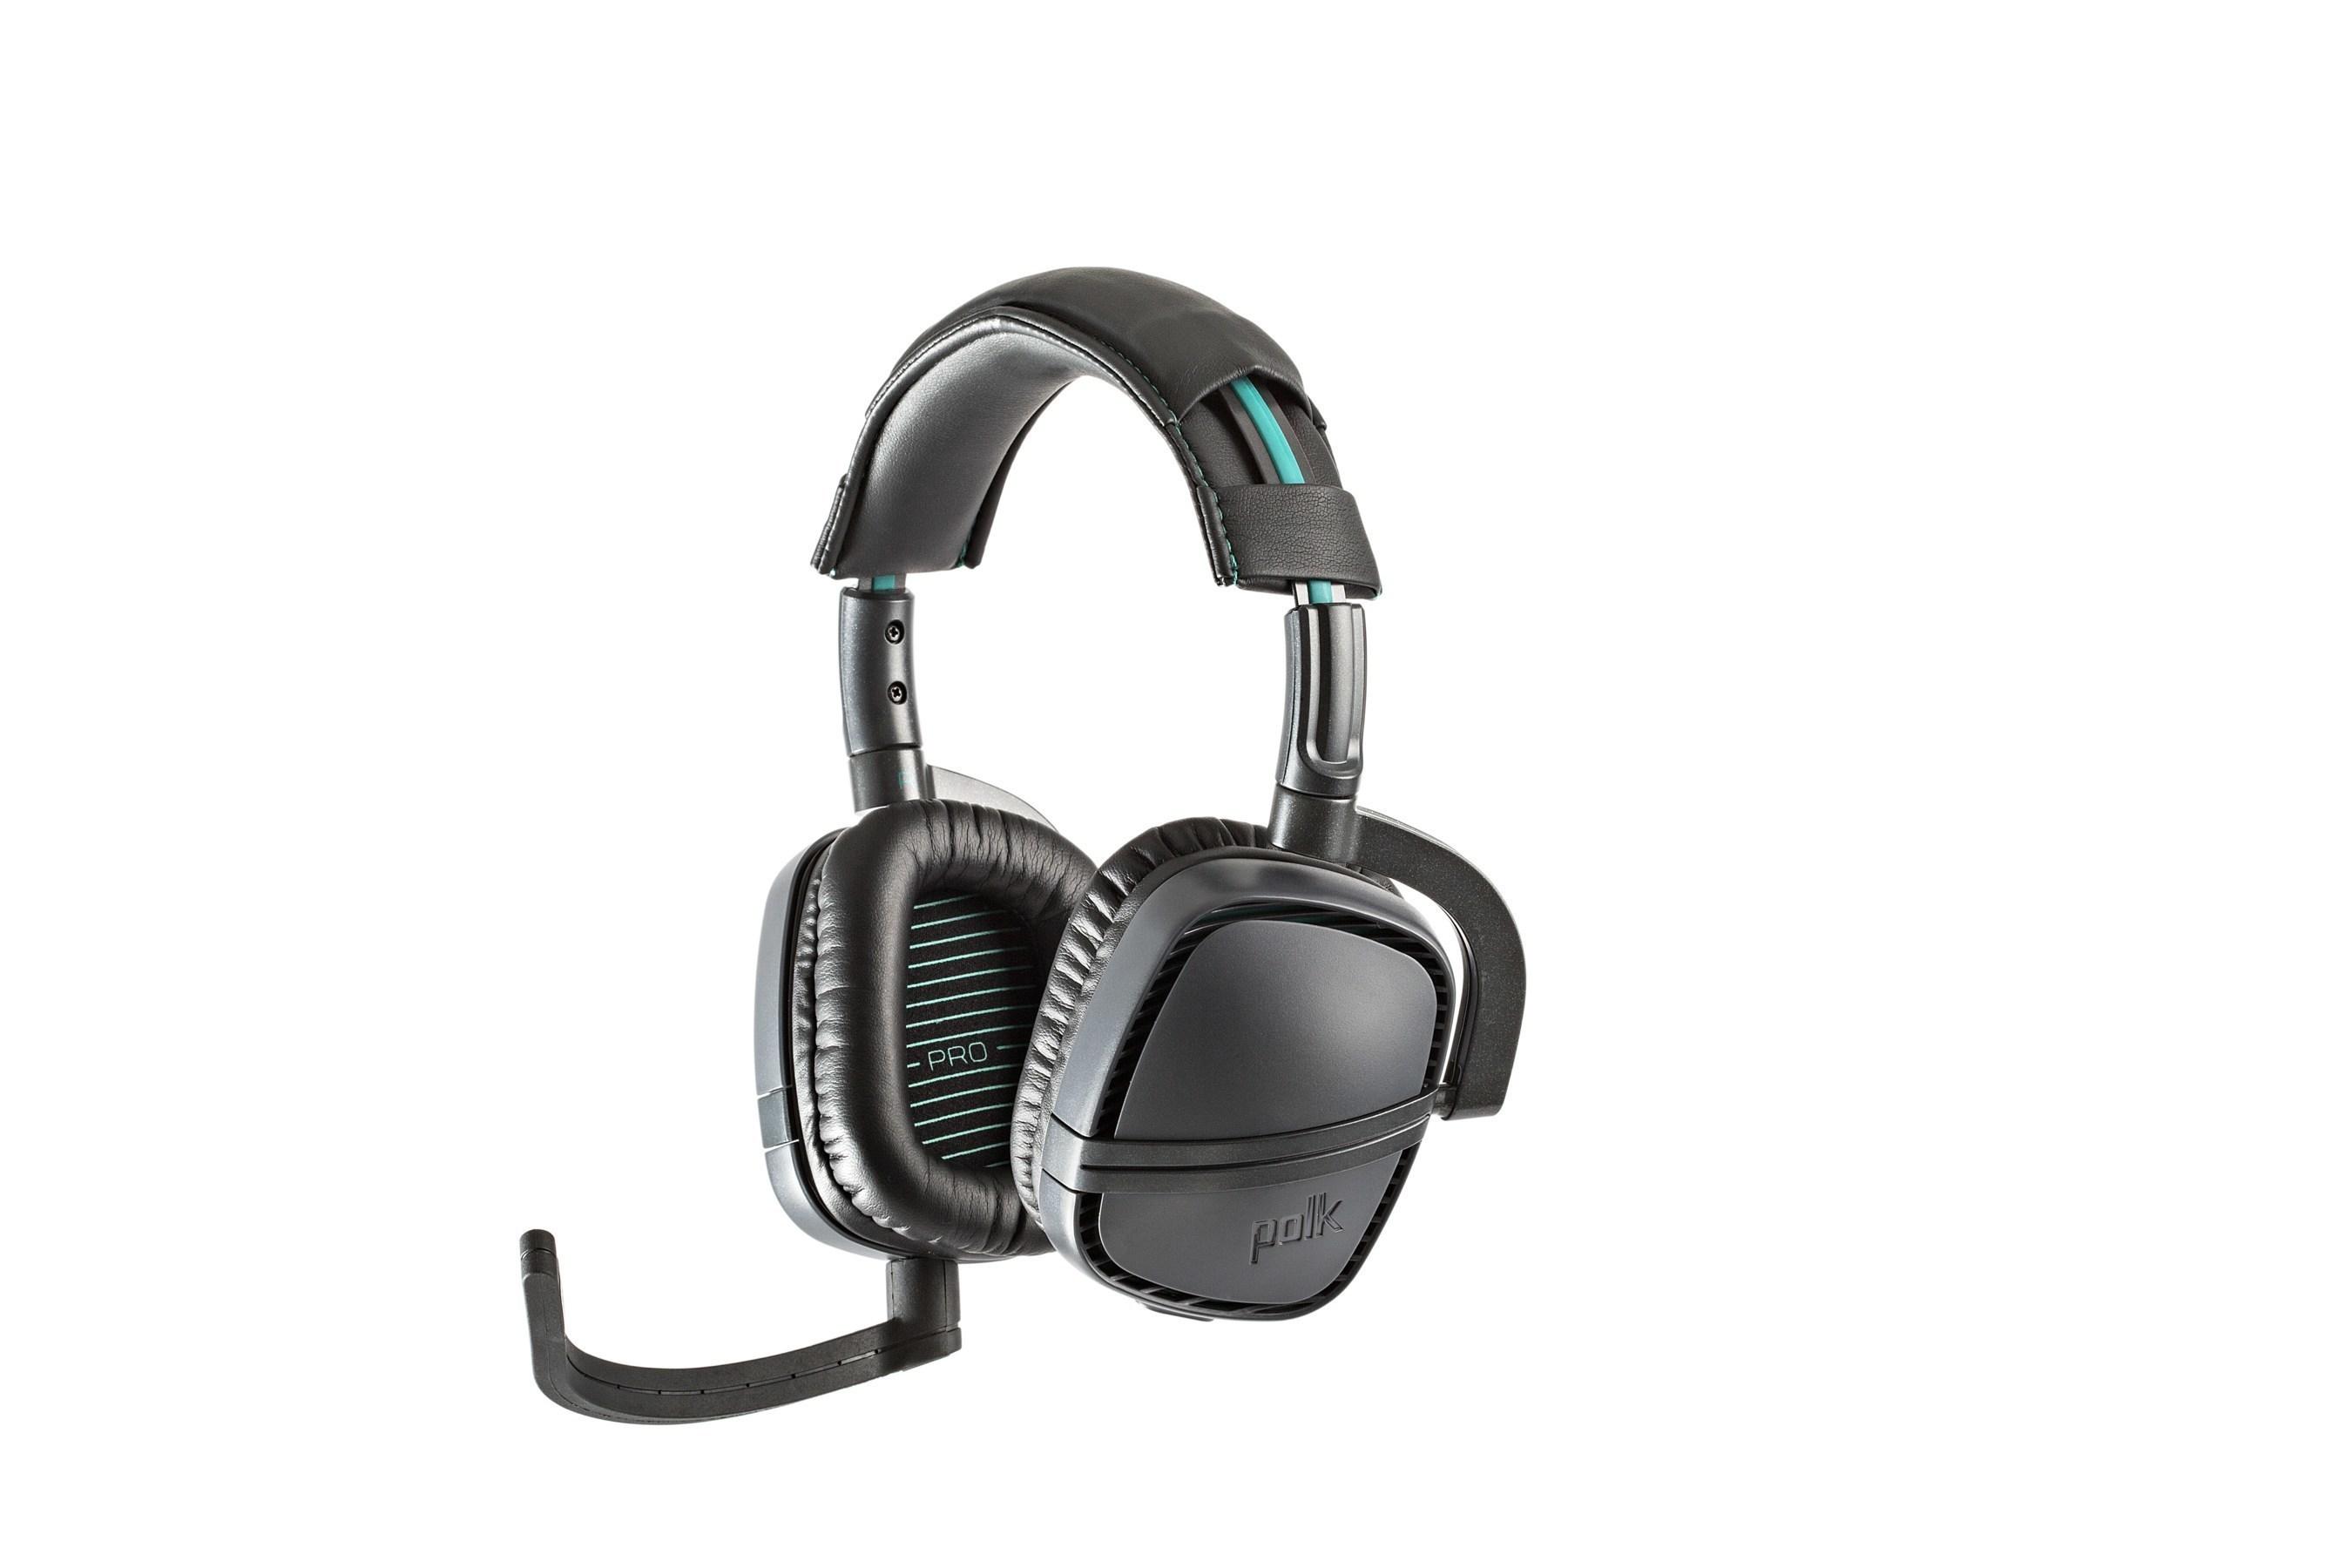 Polk Audio's Striker Pro Zx Gaming Headset